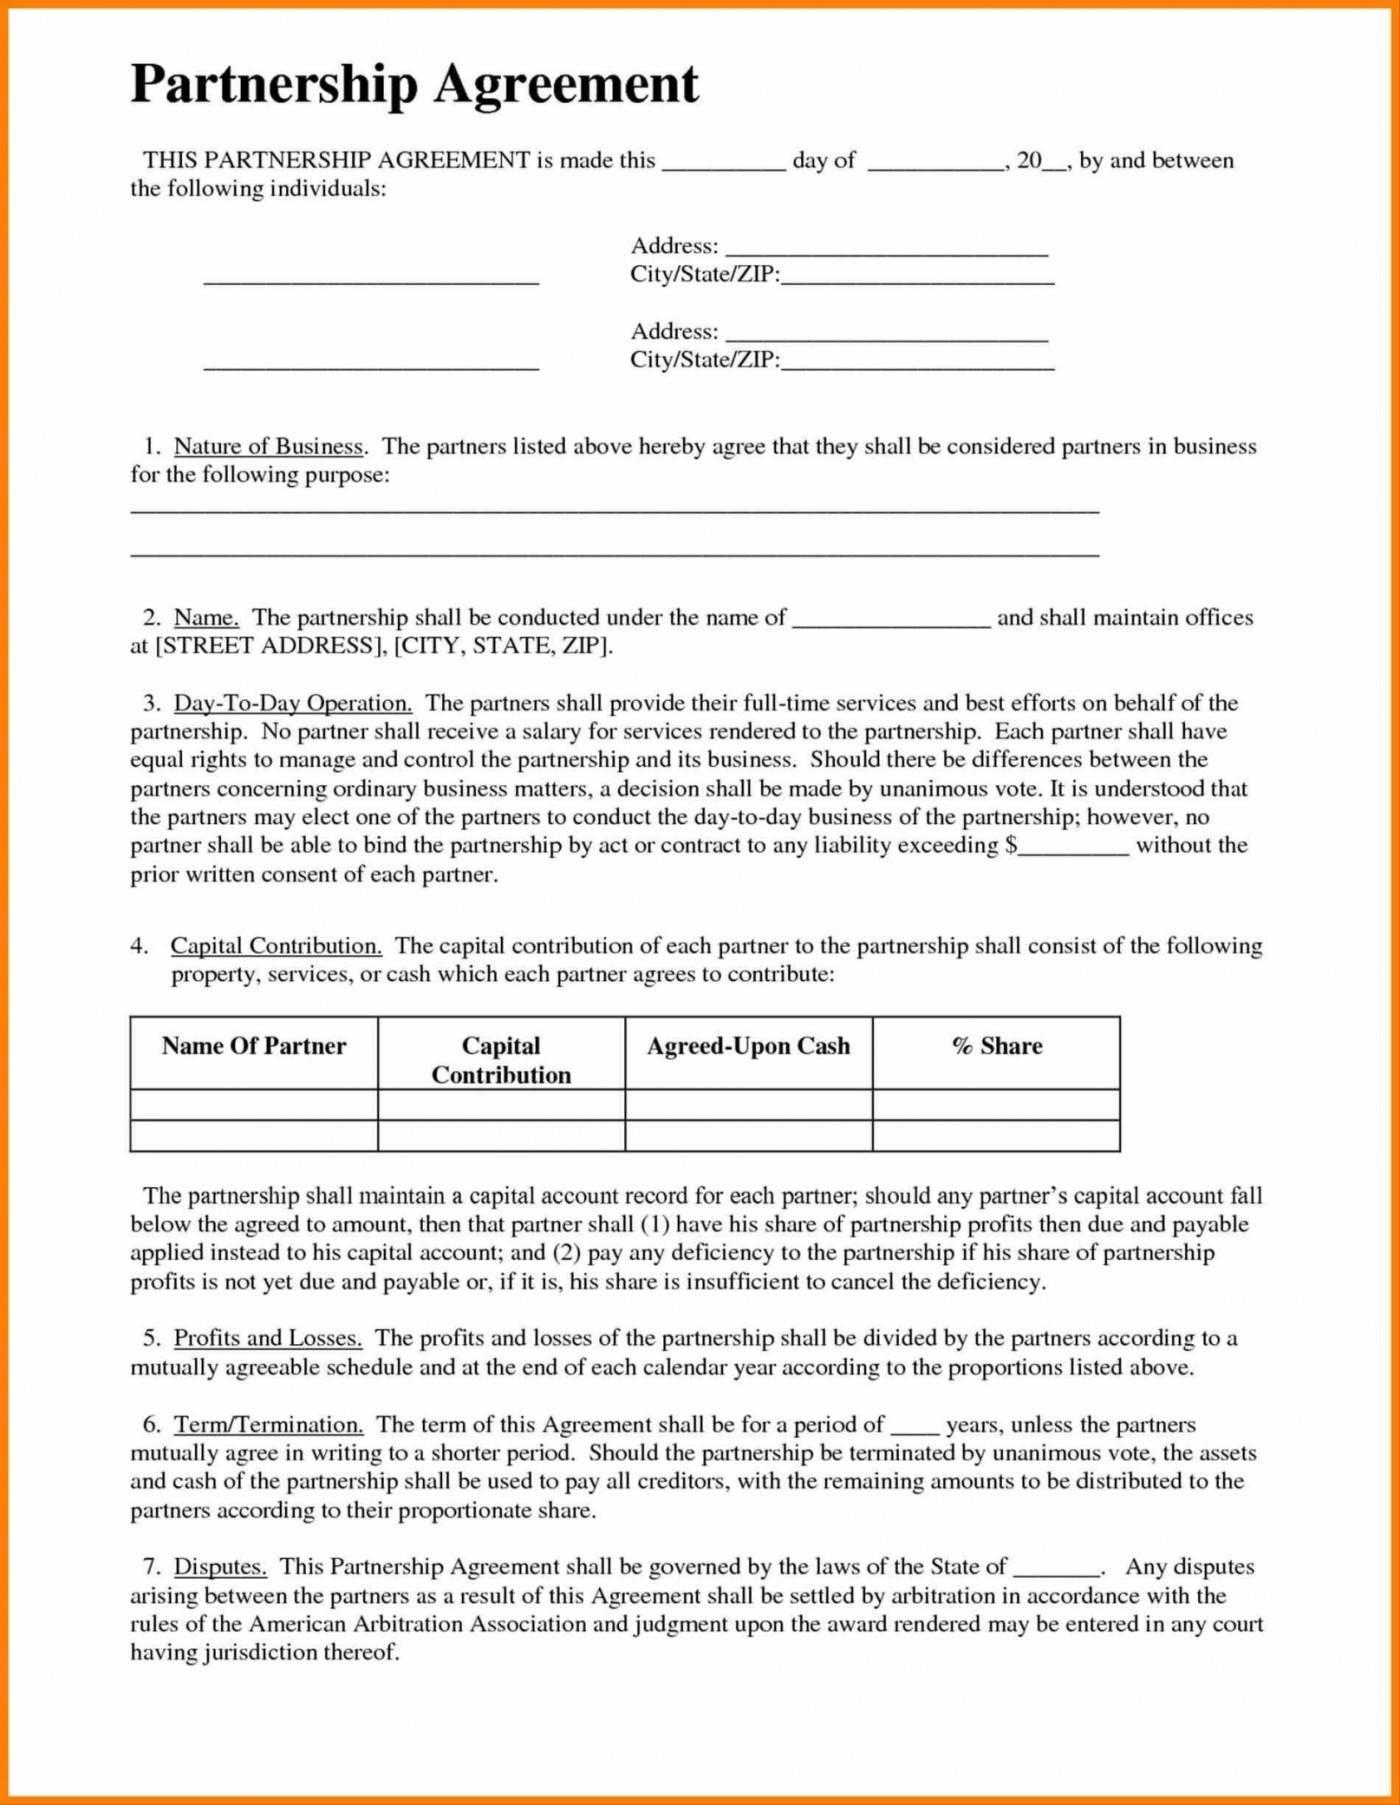 Partnership Agreement Template California